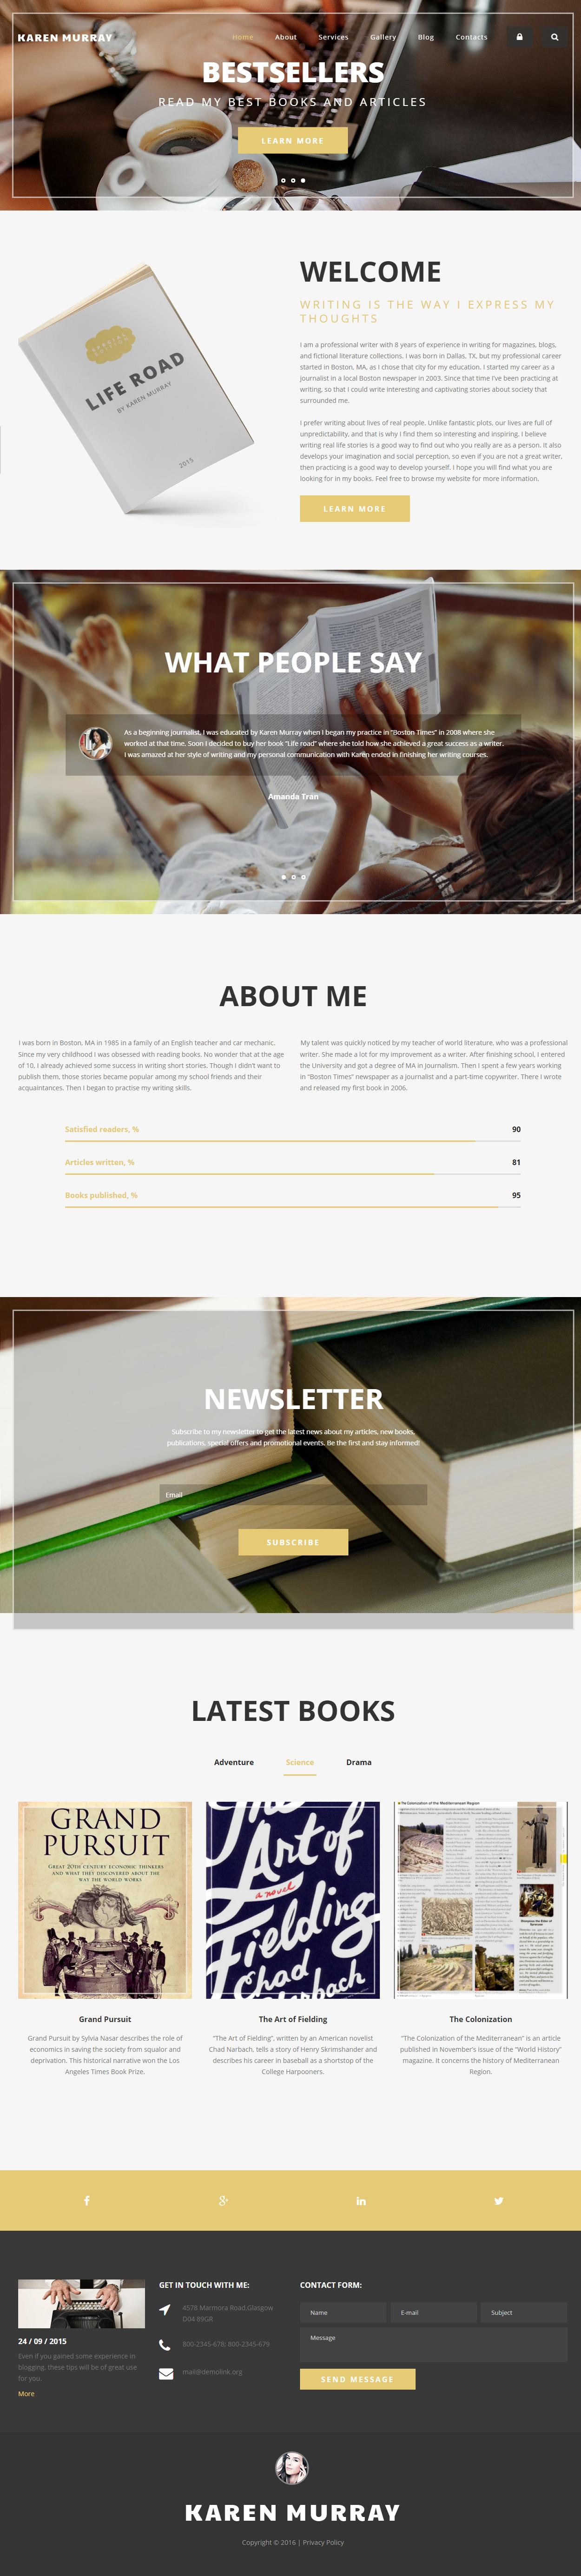 Best freelance writer websites designed